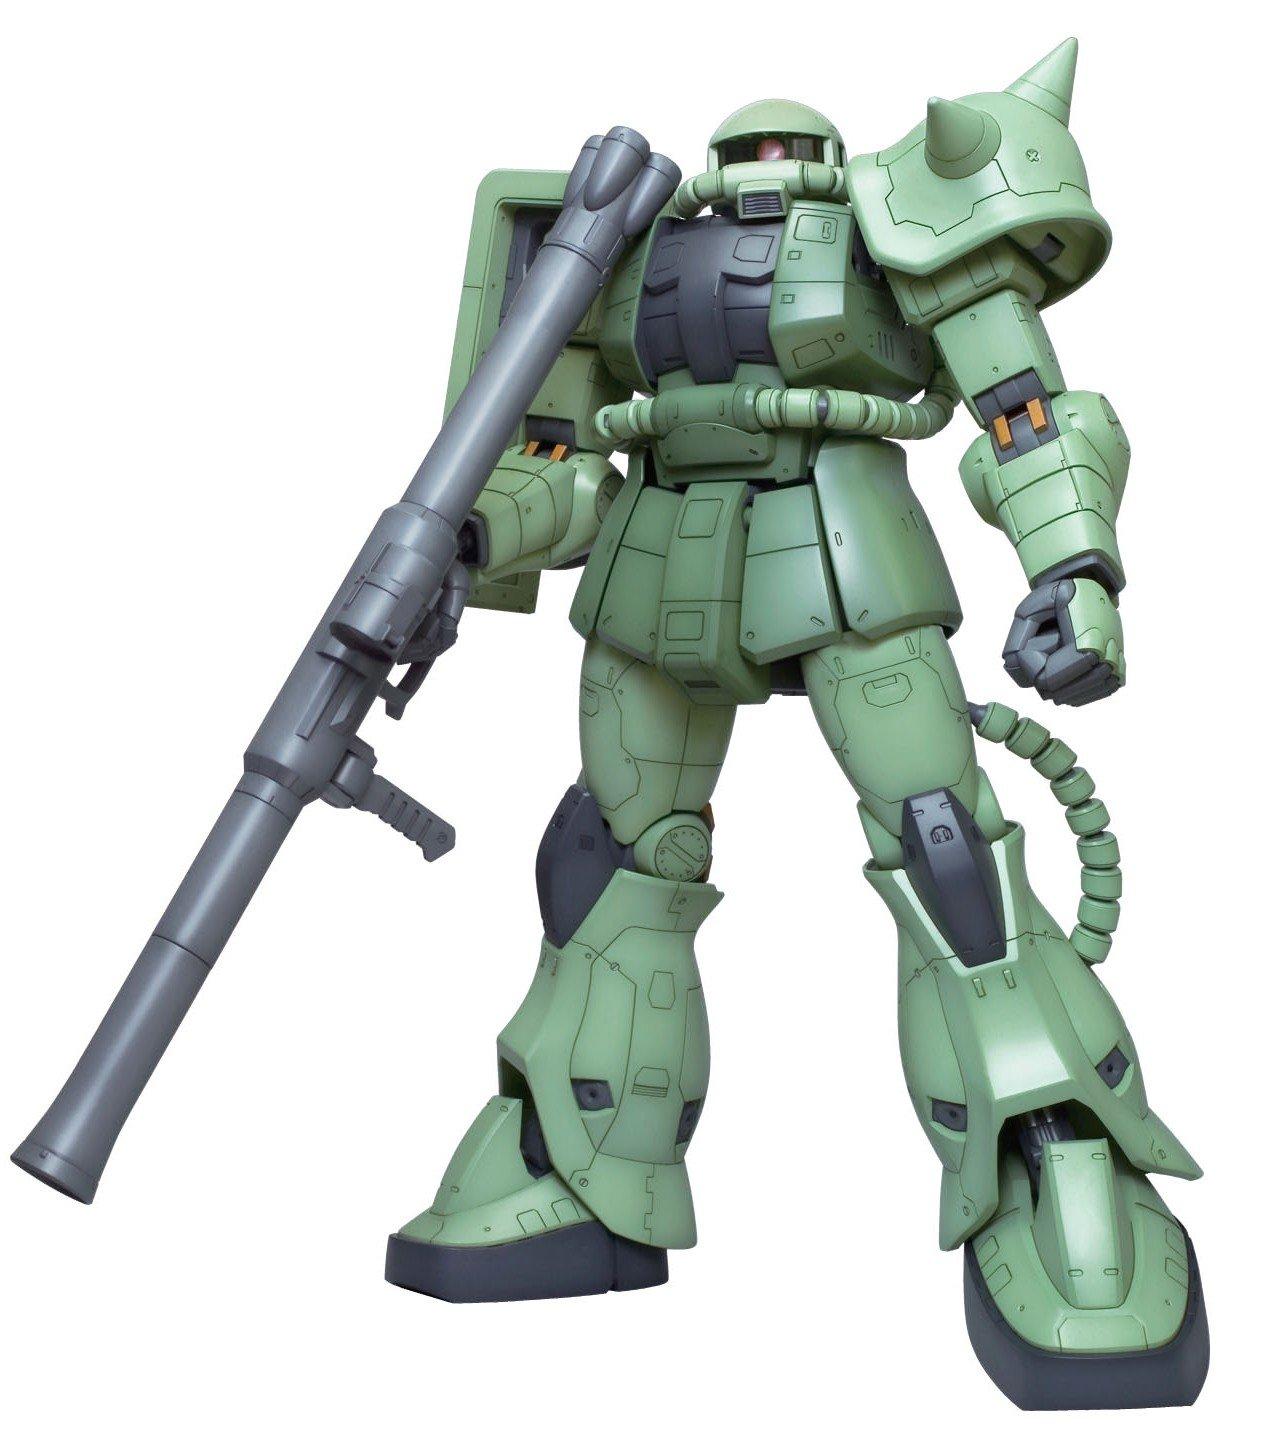 Bandai Hobby MS-06 Zaku Ii Ii Ii 1/48, Bandai Mega tamaño figura de acción a167df